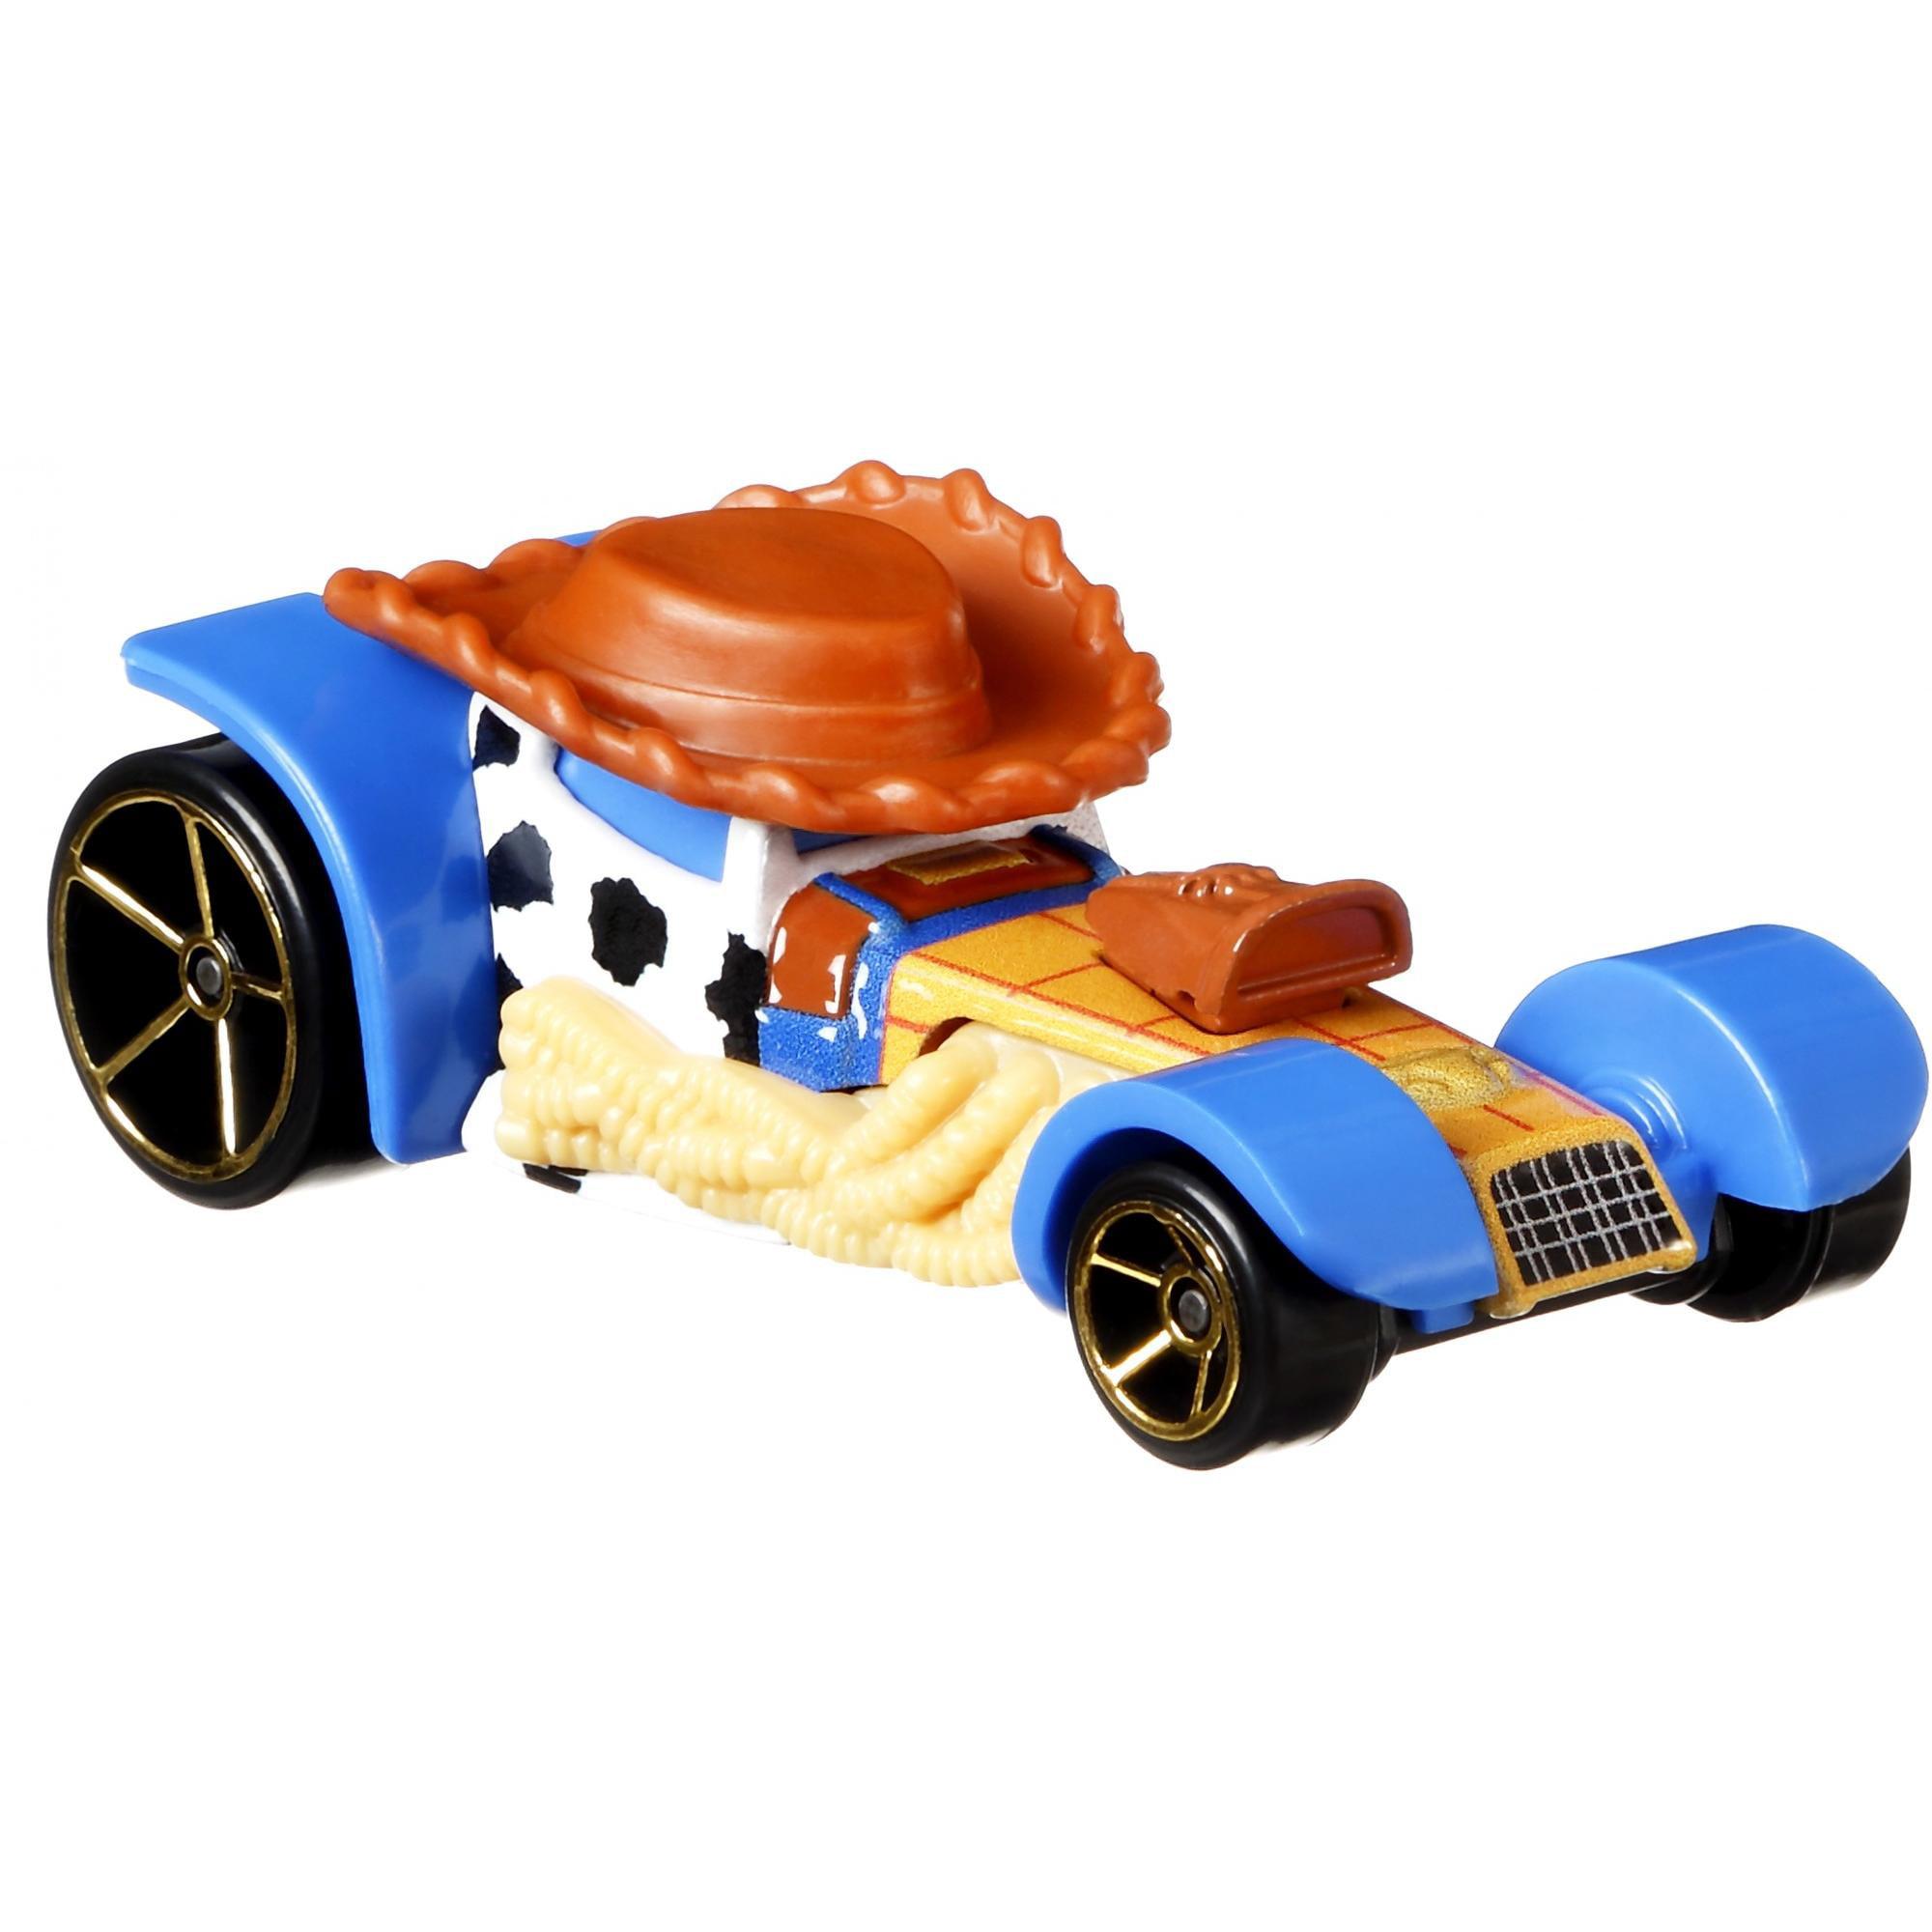 Hot Wheels Disney Pixar Toy Story Woody Character Car